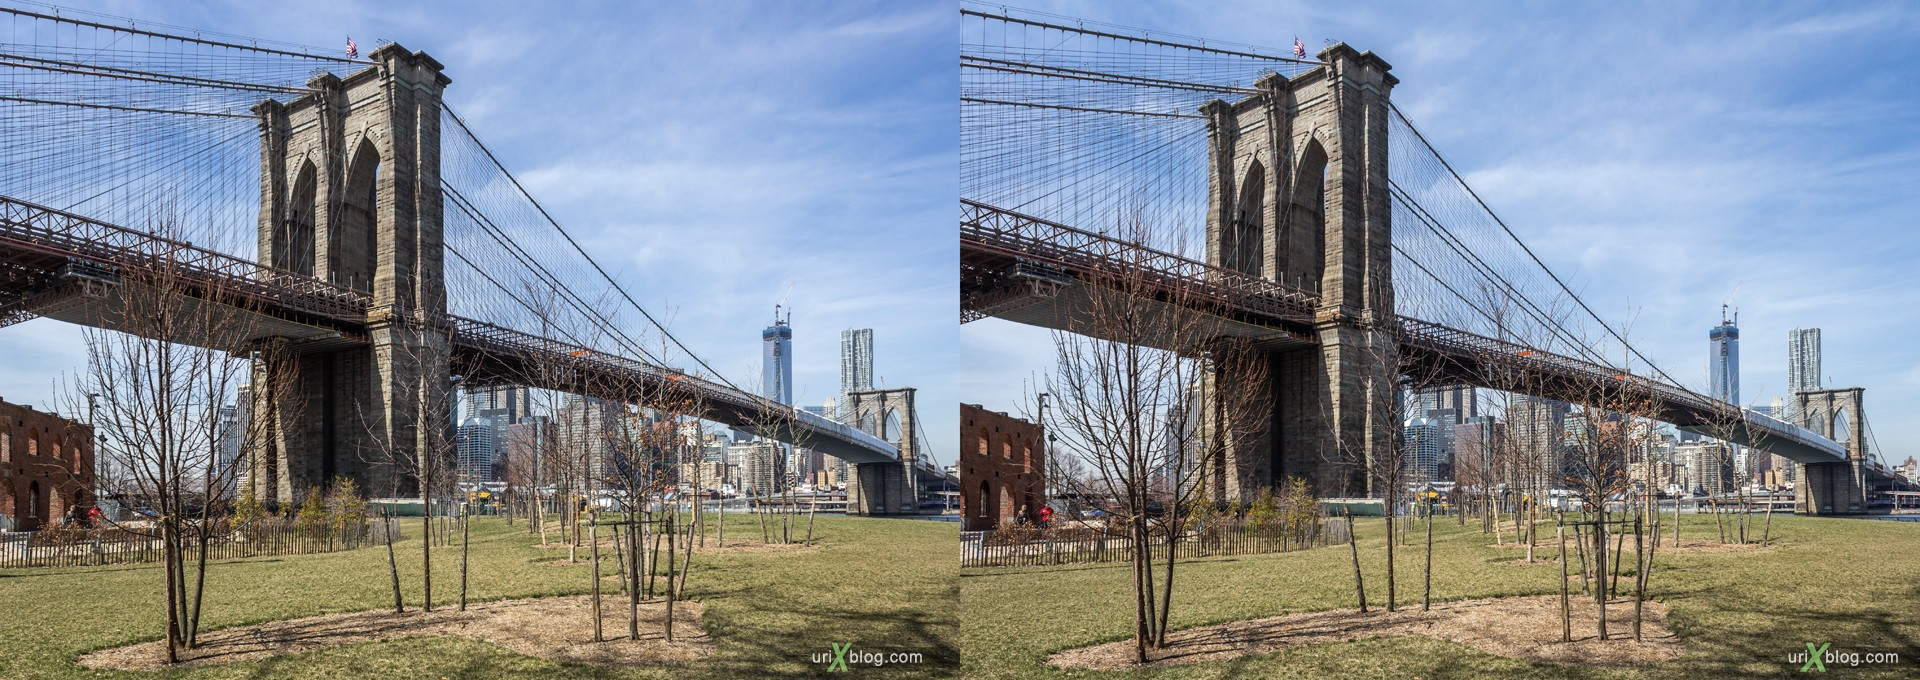 2013, Brooklyn Bridge парк, Нью-Йорк, США, 3D, перекрёстные стереопары, стерео, стереопара, стереопары